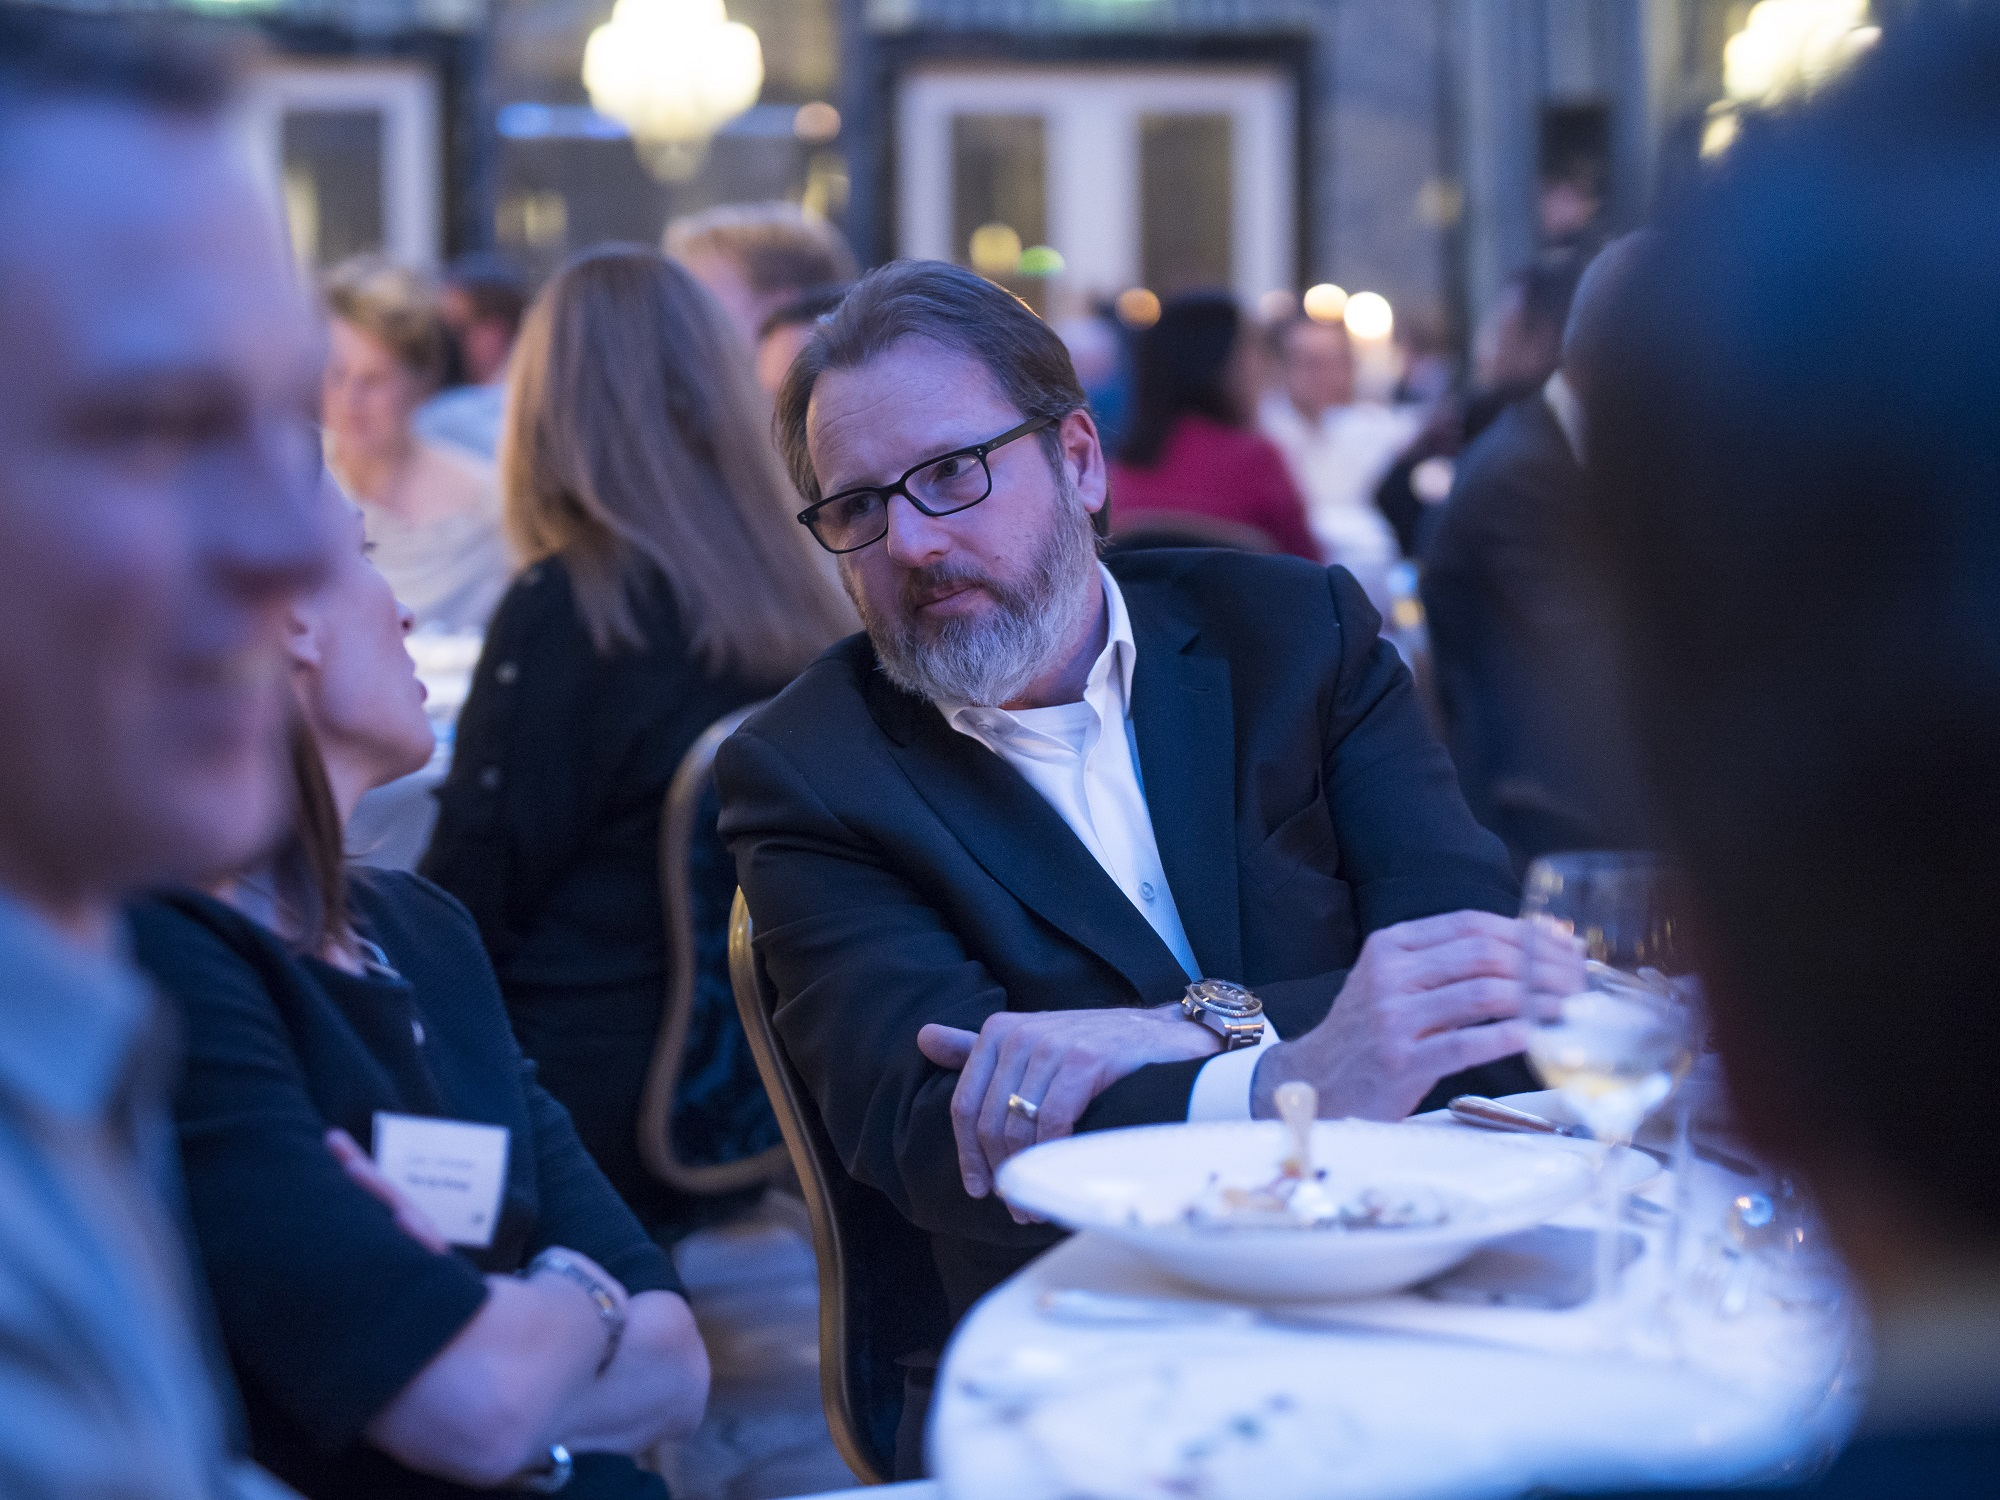 The-Up-Group-Digital-Masters-Dinner-London-2018-Clare Johnson-Alex-Chesterman.jpg